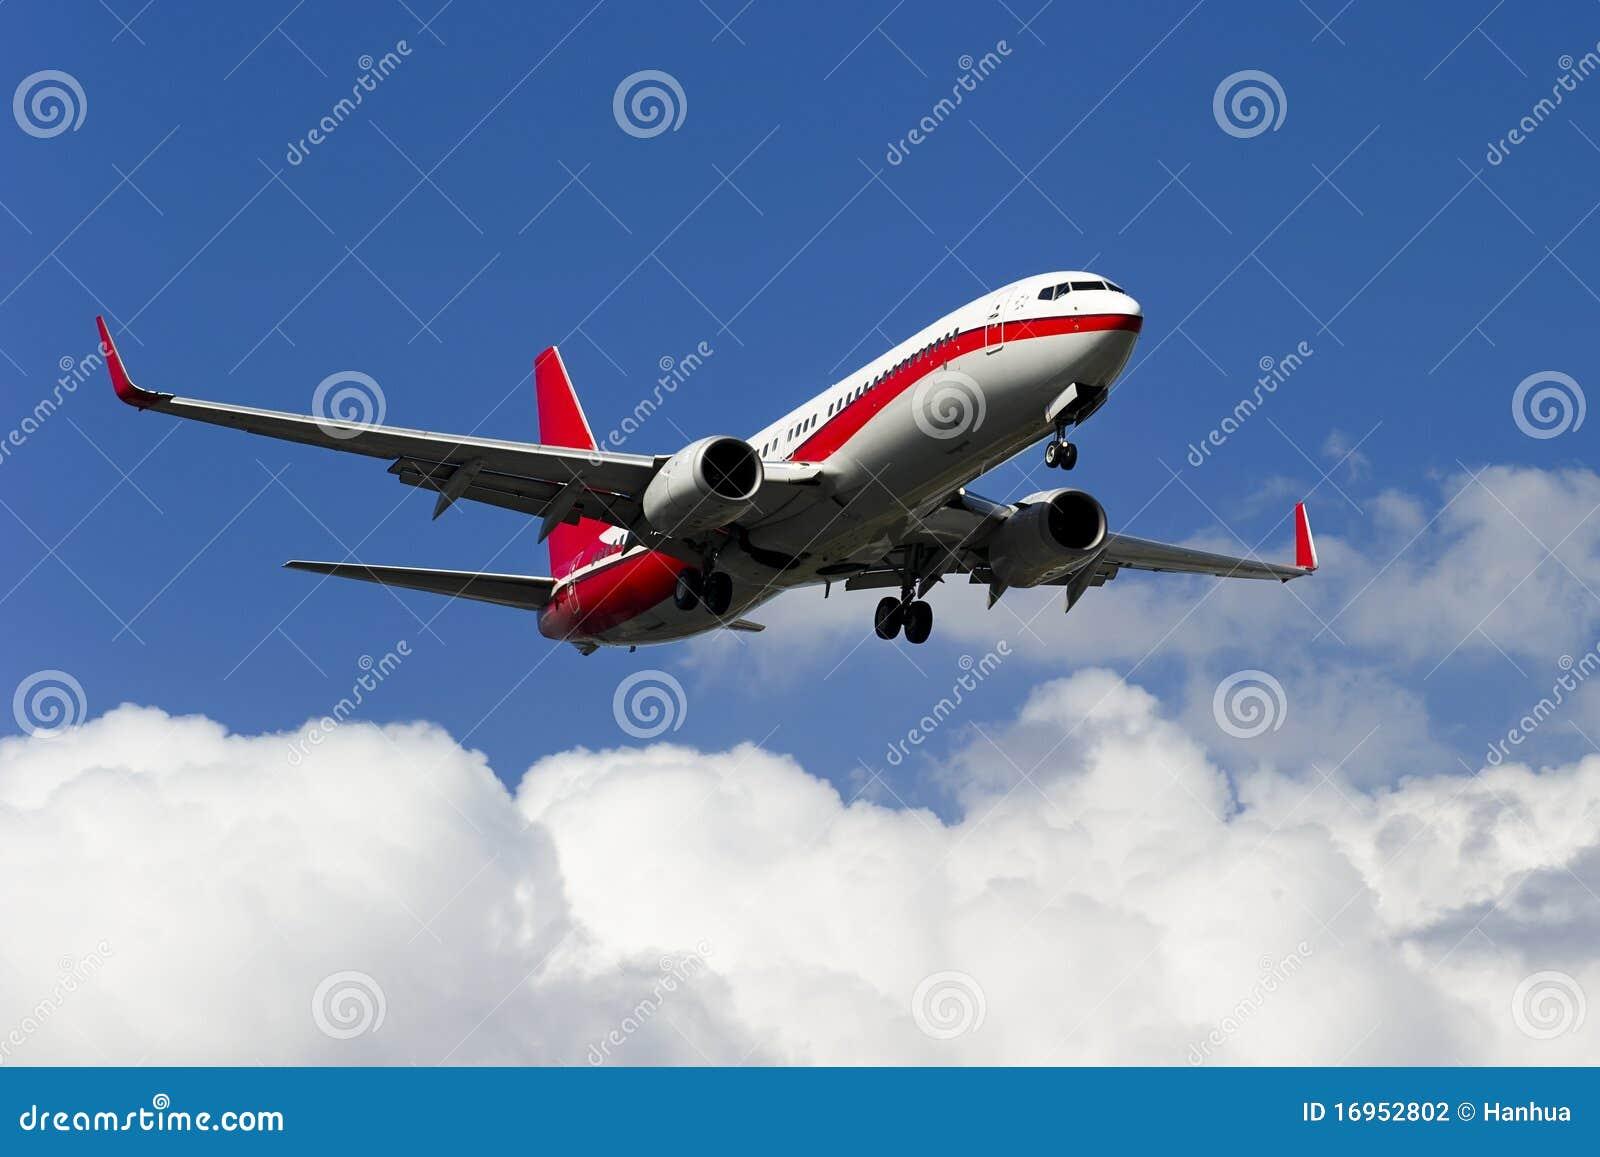 737 800 flygplan boeing